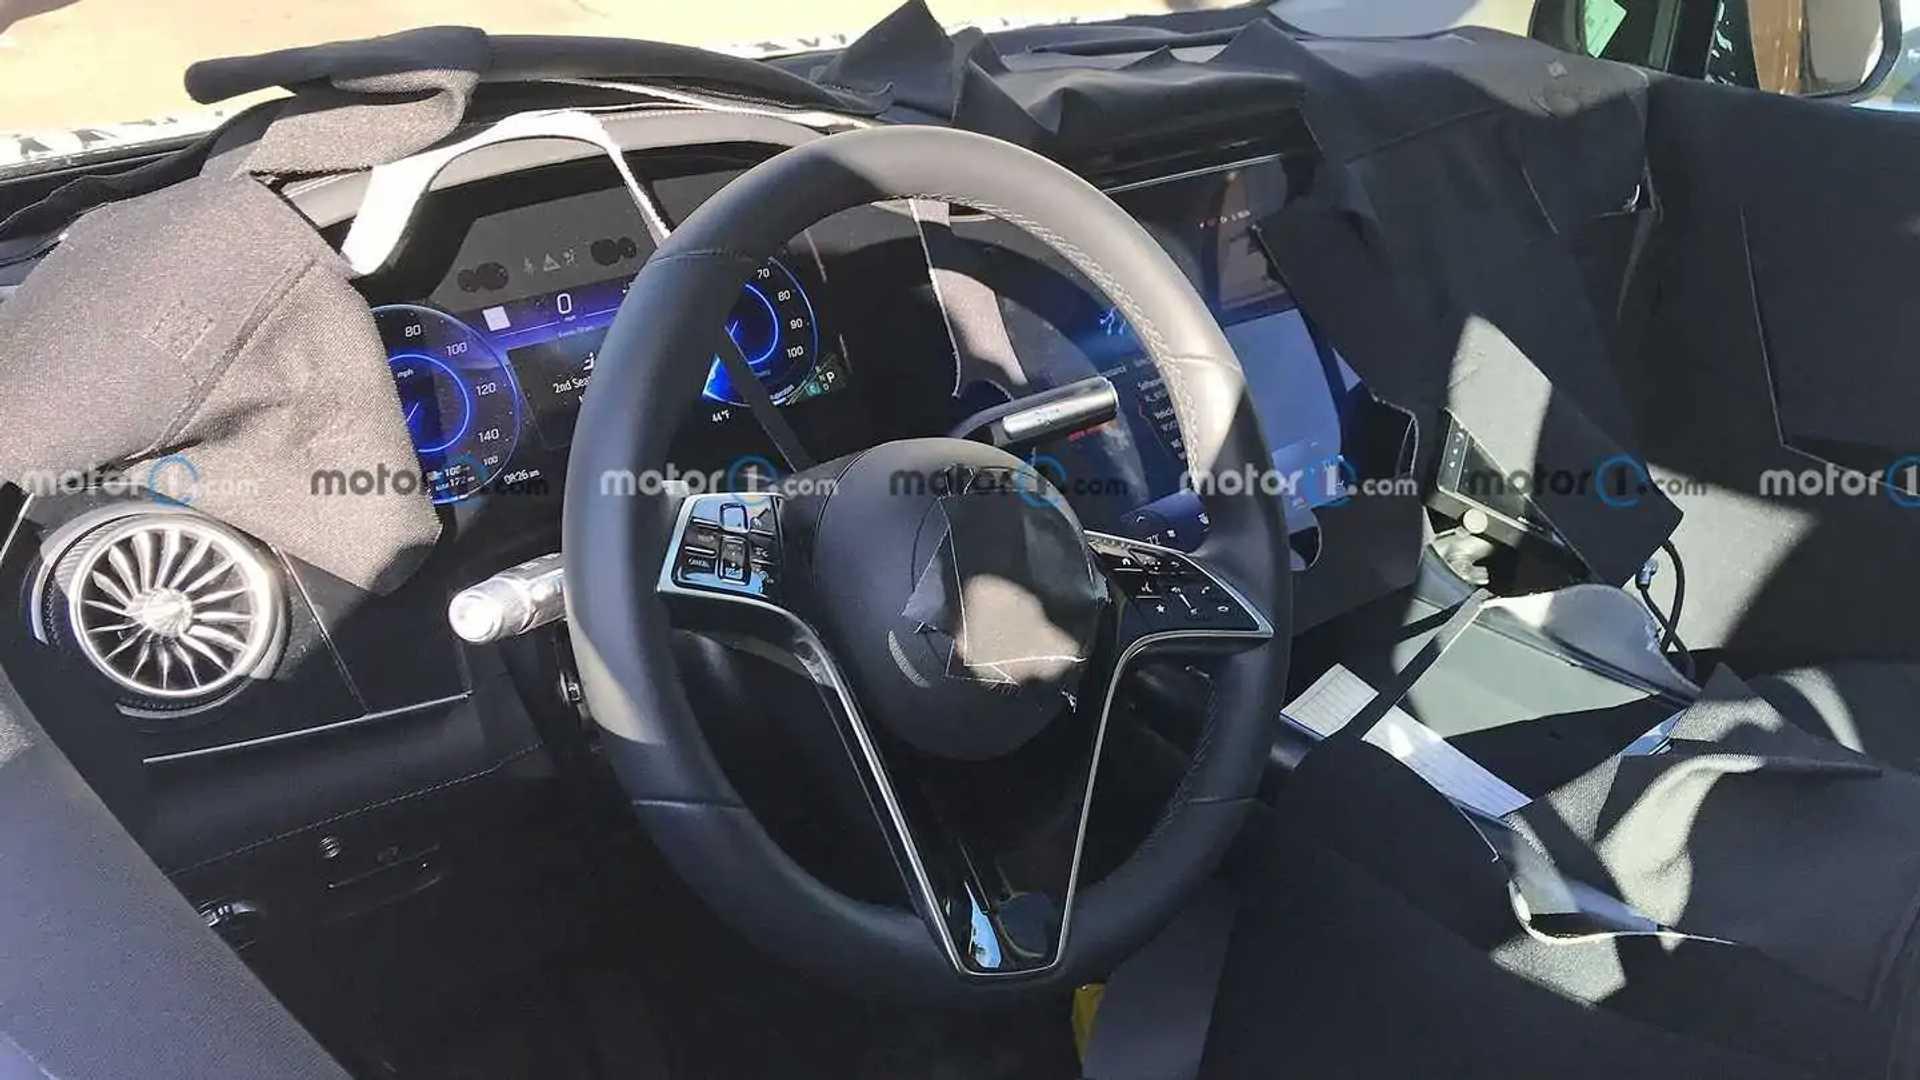 mercedes-maybach eqs suv announced, electric g-class